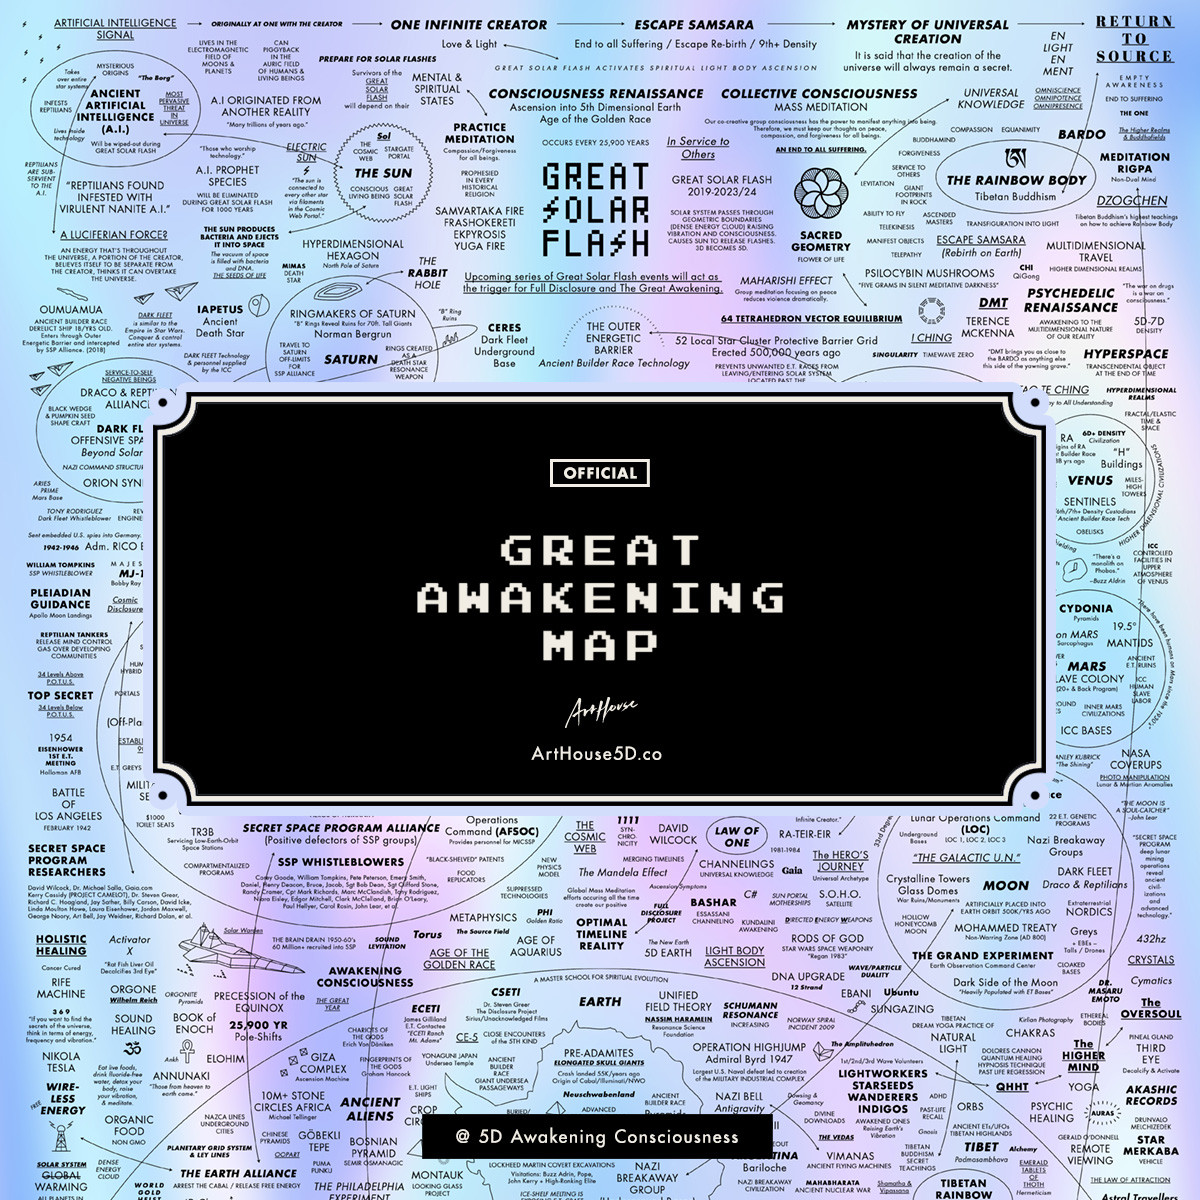 www.greatawakeningmap.co